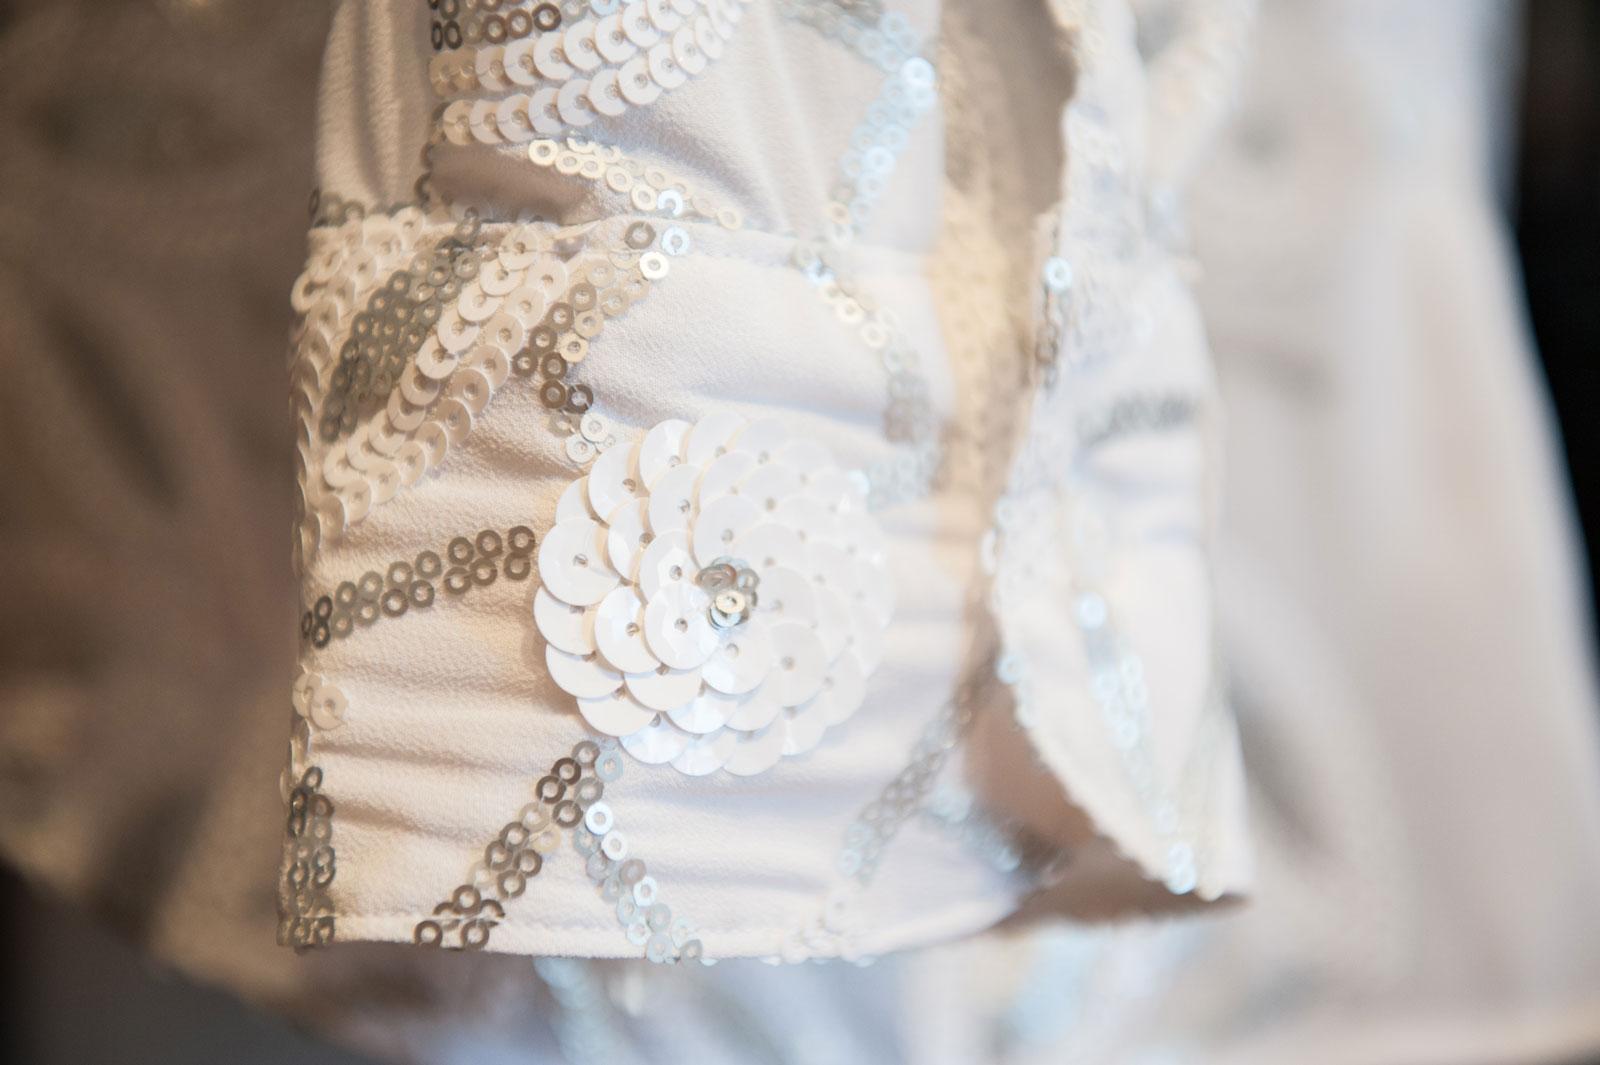 daniels-custom-clothing-minneapolis-052